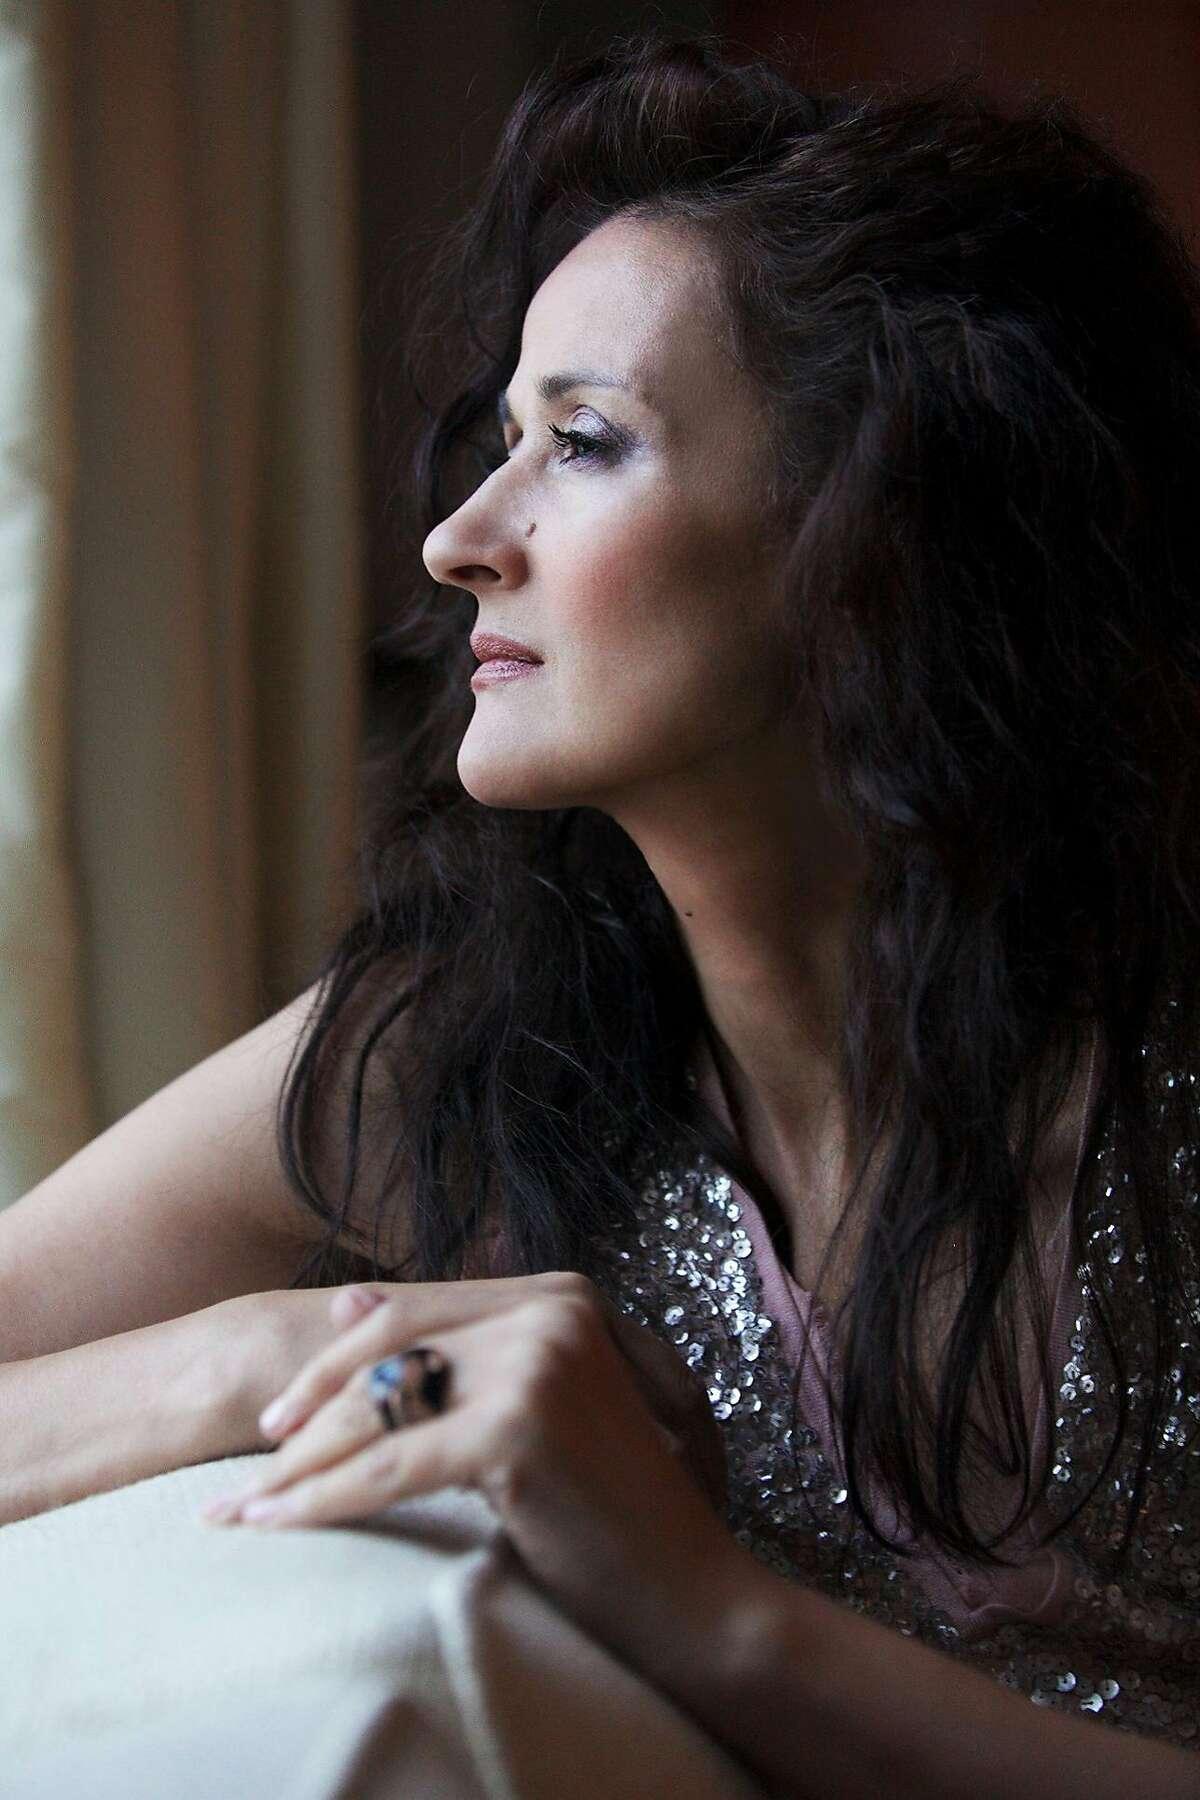 Jazz vocalist Teresa Souter will be performing in San Francisco and Santa Cruz.